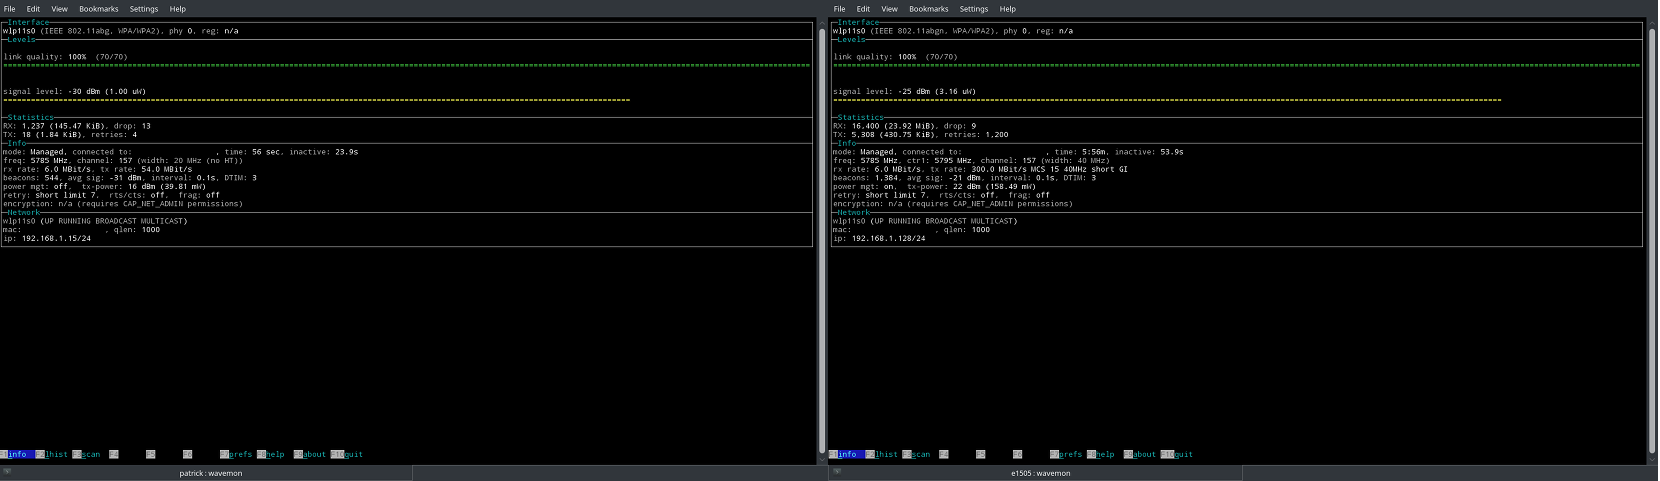 Intel 3945ABG (Left) vs 7260 (Right) - wavemon